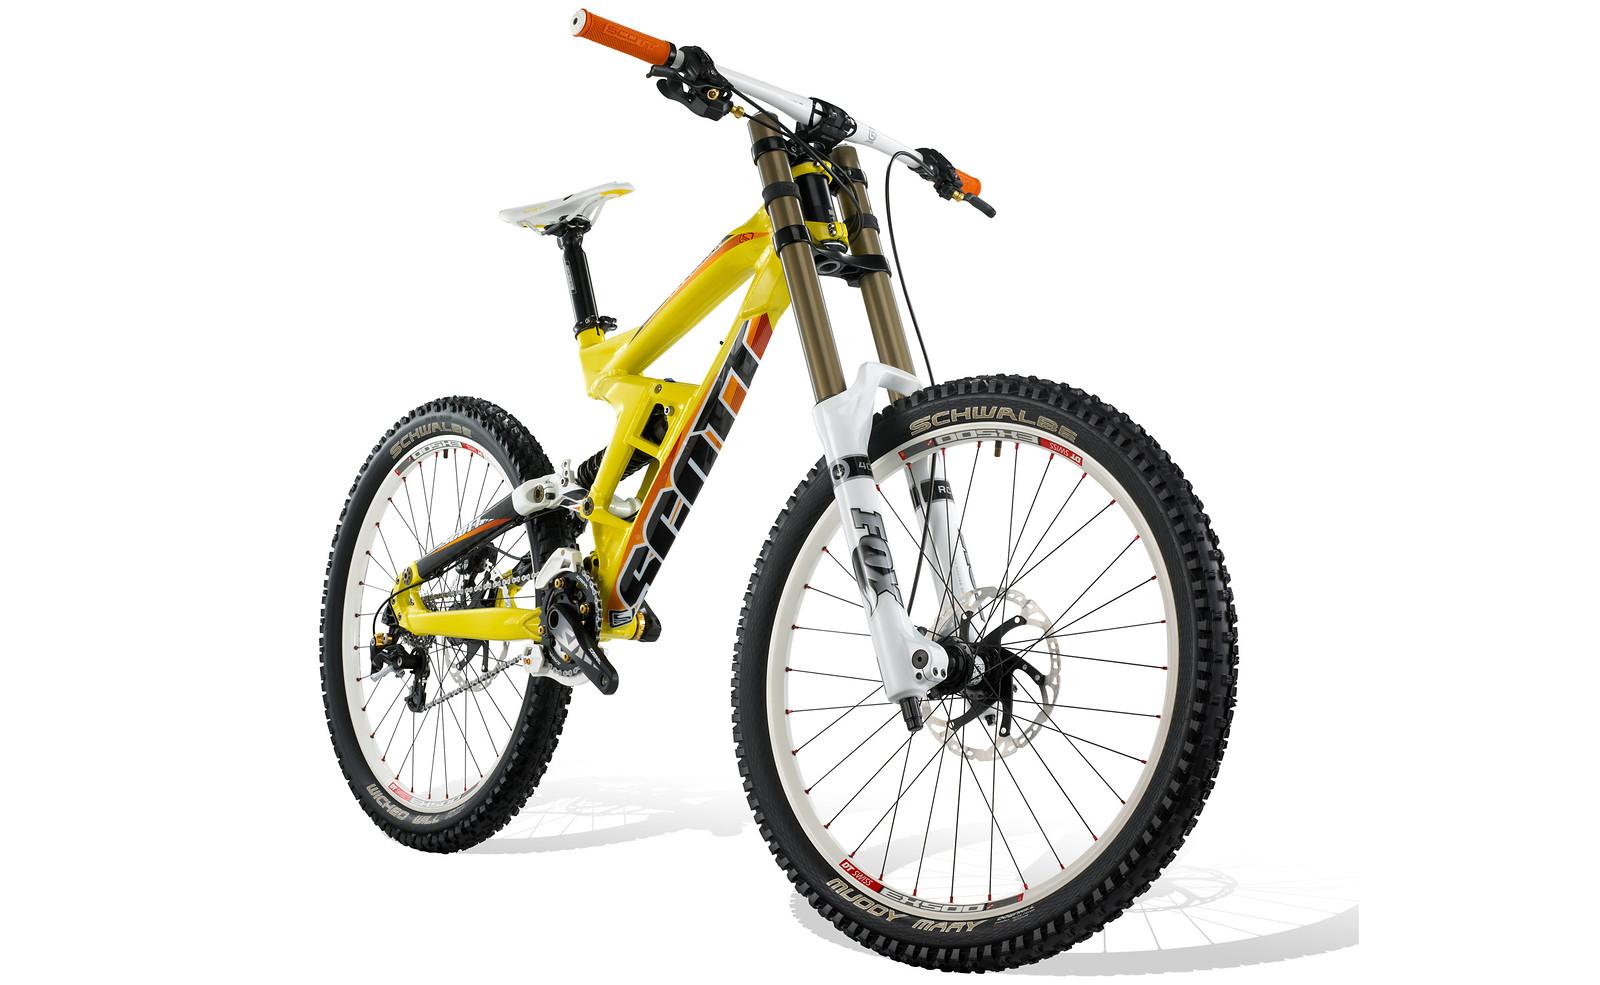 Gambler 10 - Scott Sports - Mountain Biking Pictures - Vital MTB